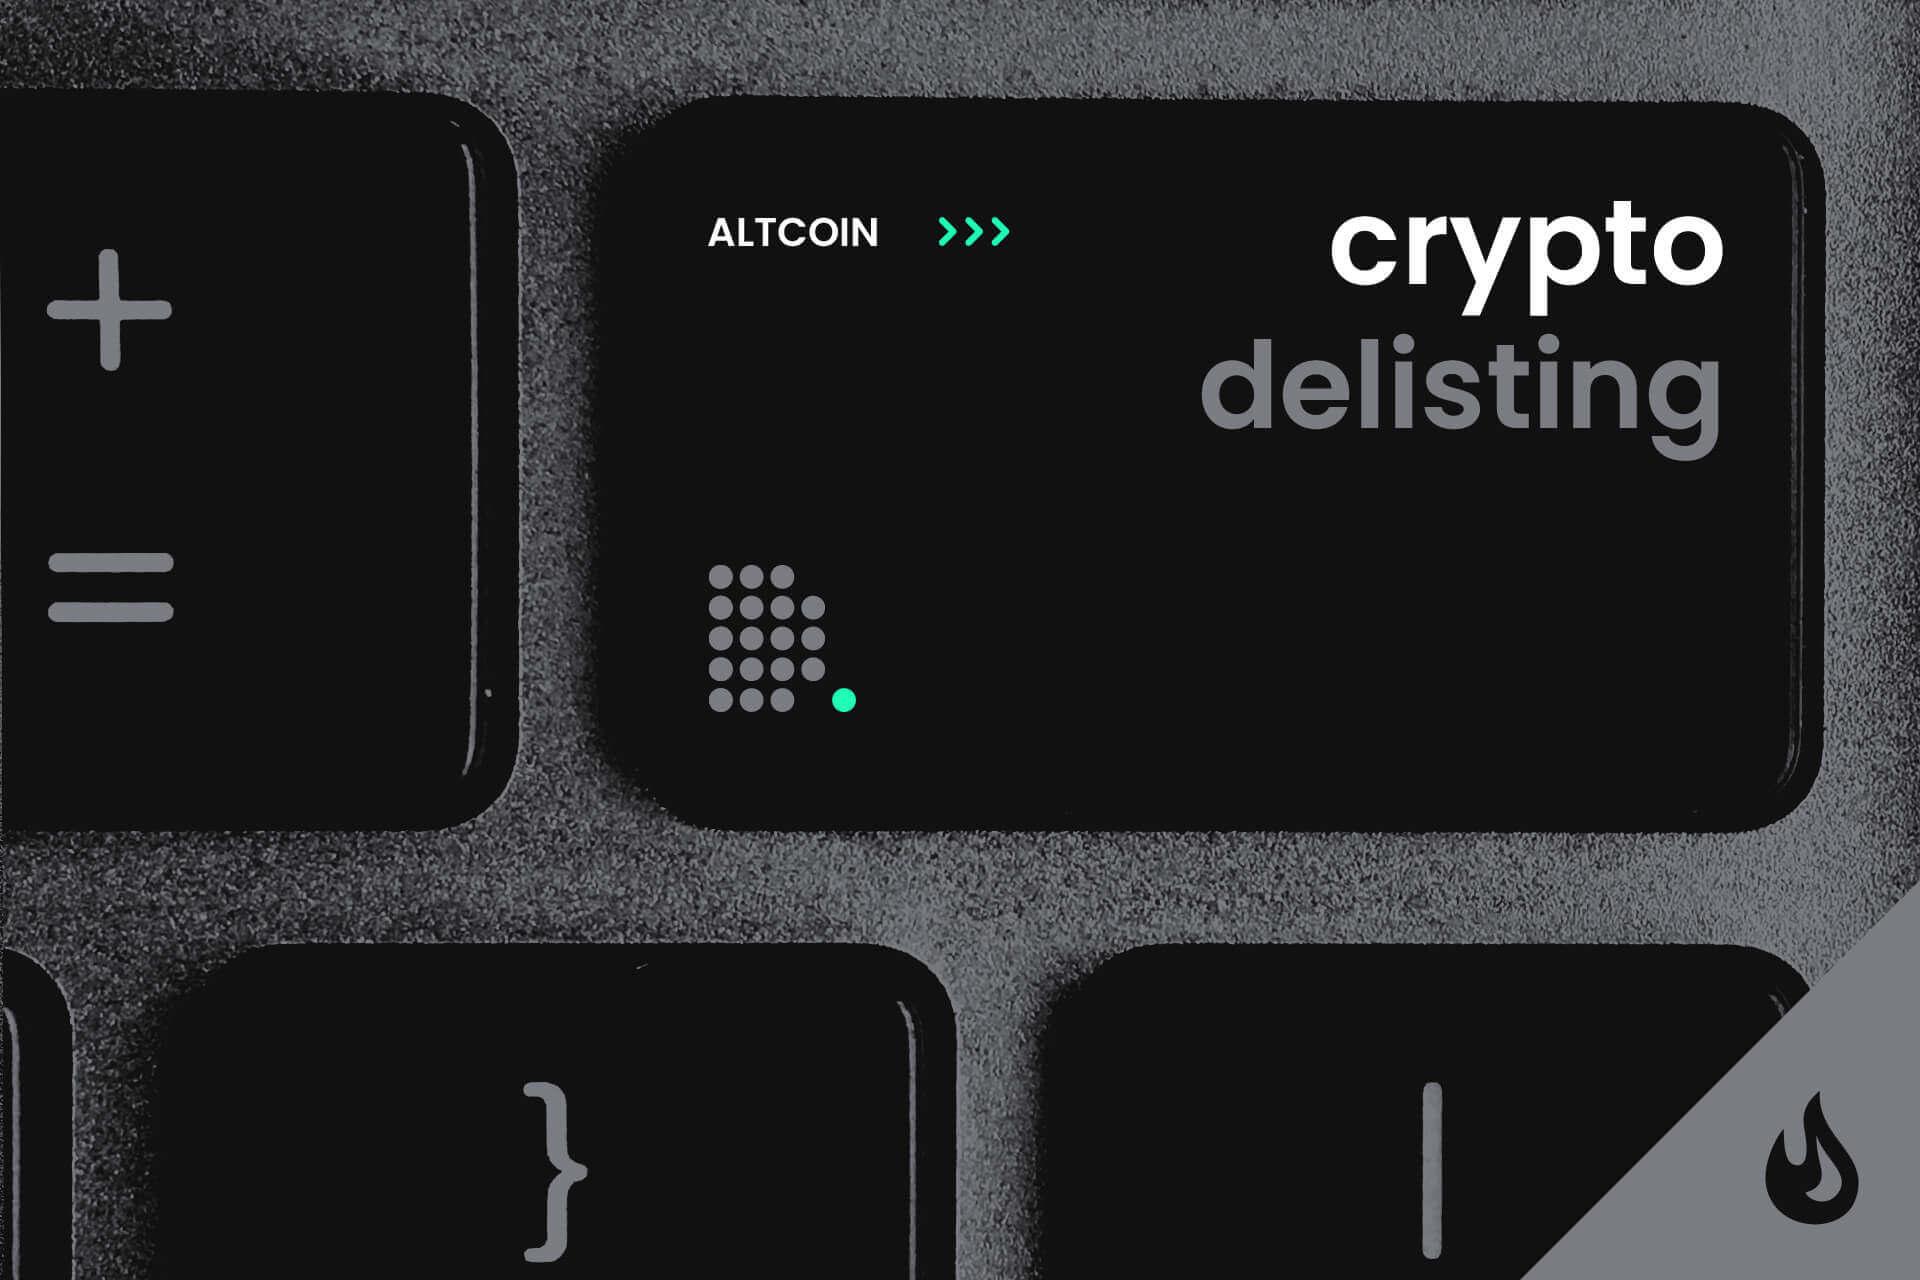 crypto delisting